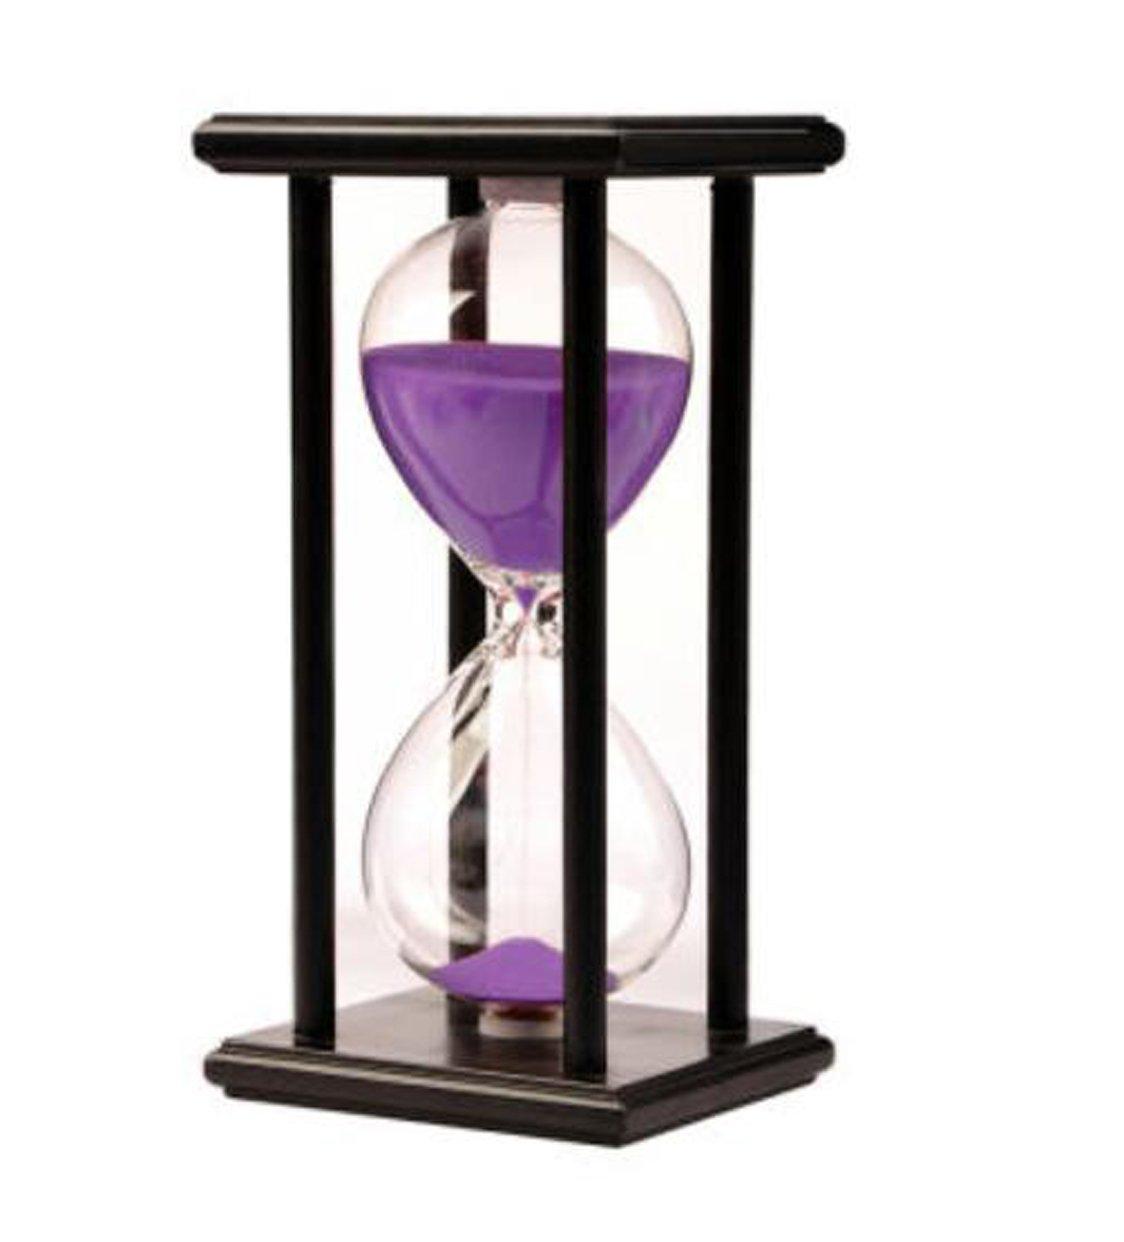 LiMeiW 30 minutes Hourglass Wooden sand Timer 45 Mins Home decoration Kitchen timer (30 minutes black box purple)